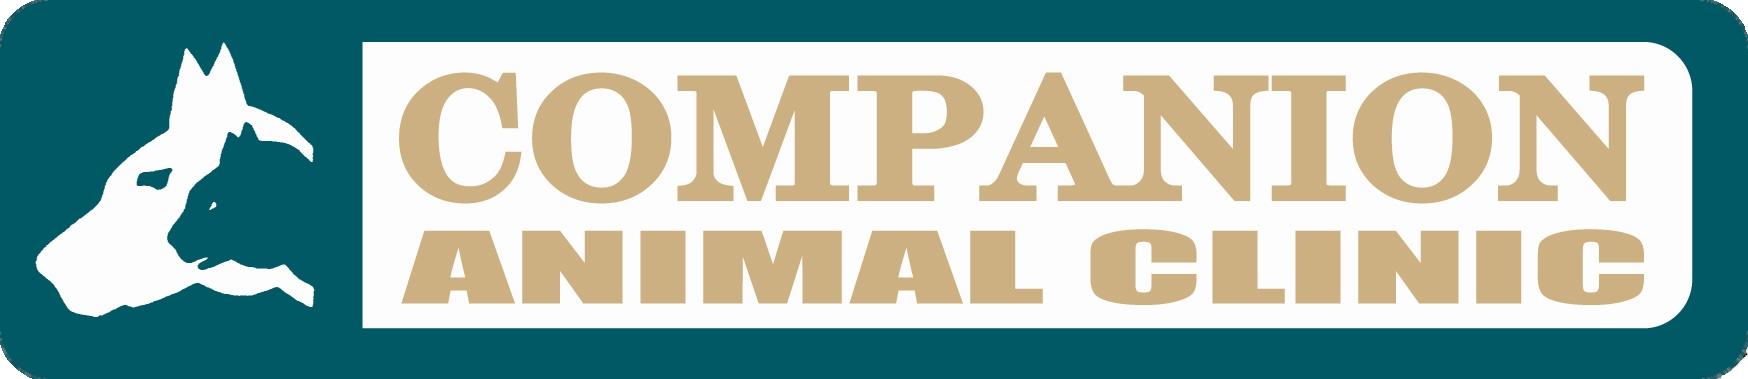 Companion Animal Logo